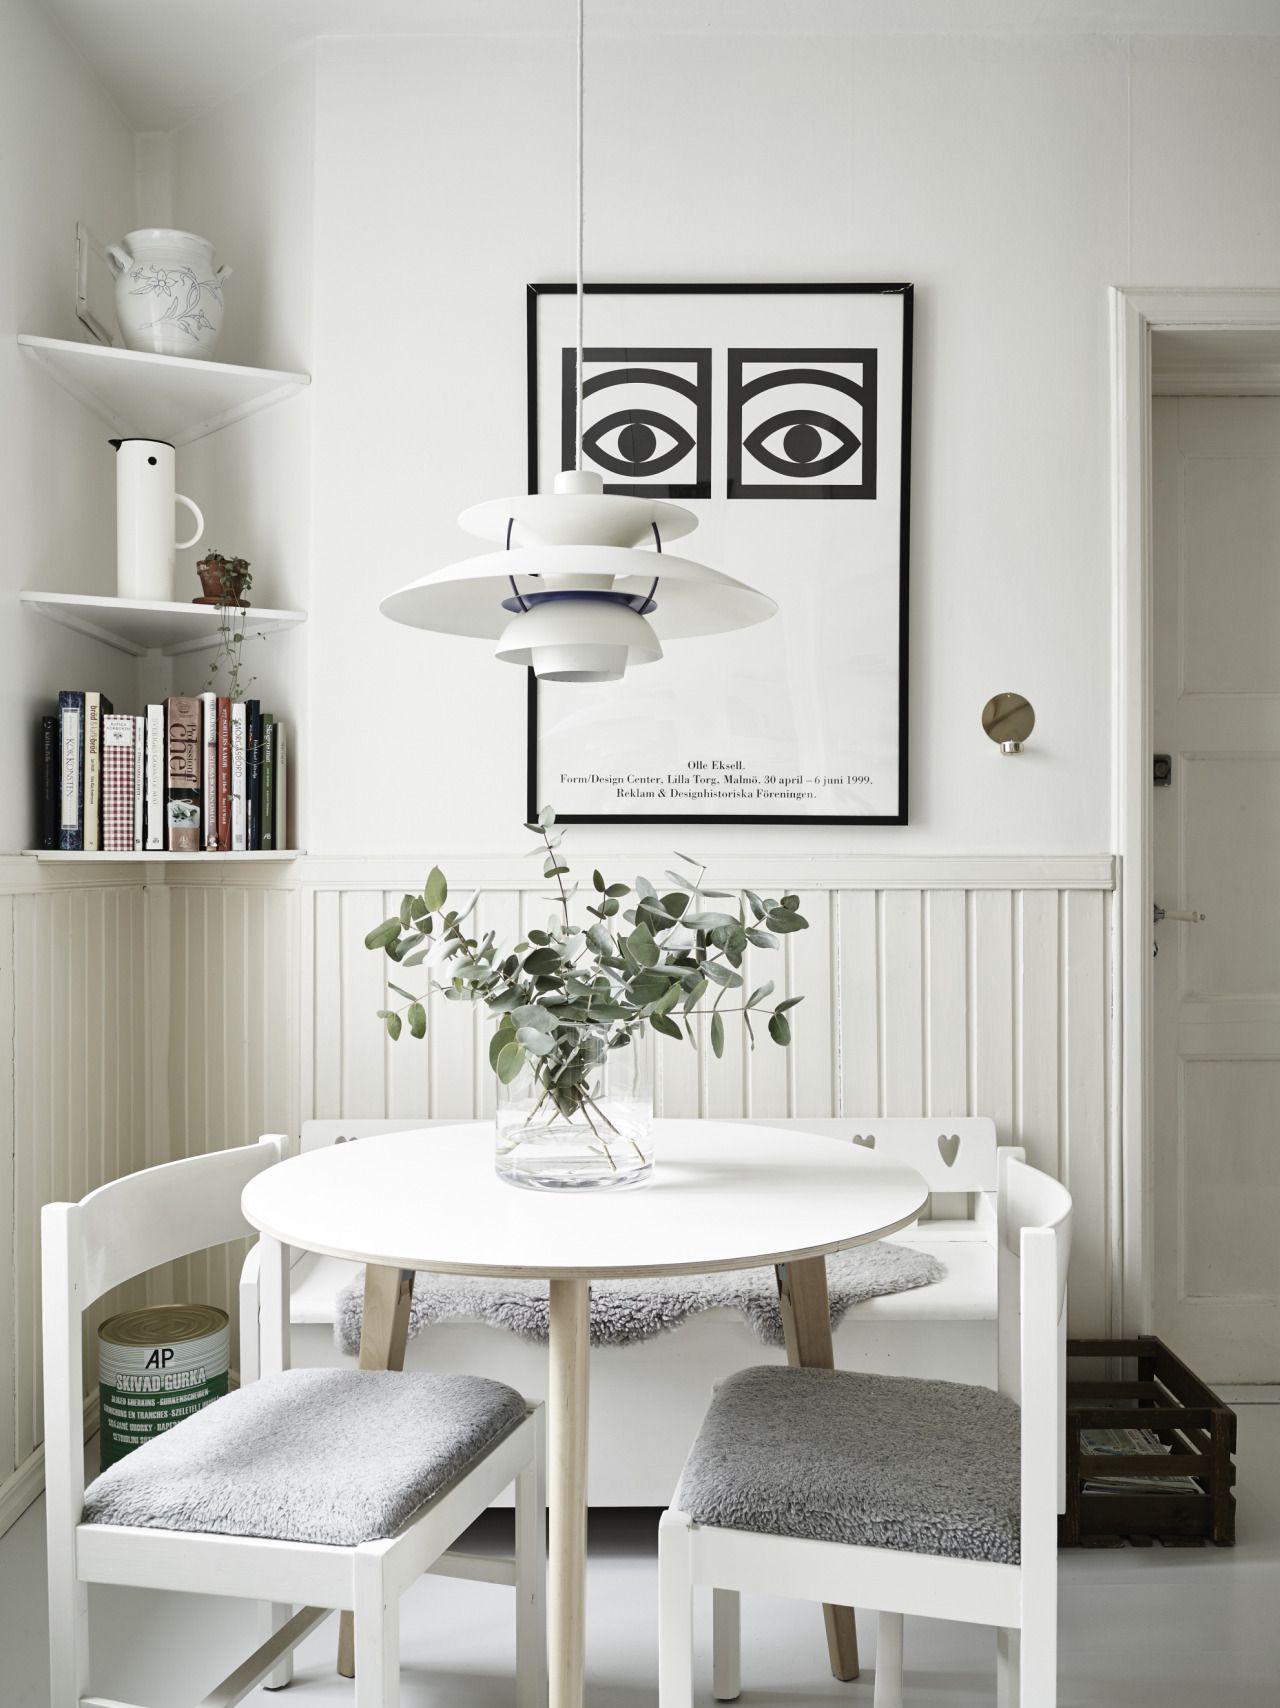 My Ideal Home U2014 Cozy White Dining Spot (via Stadshem)